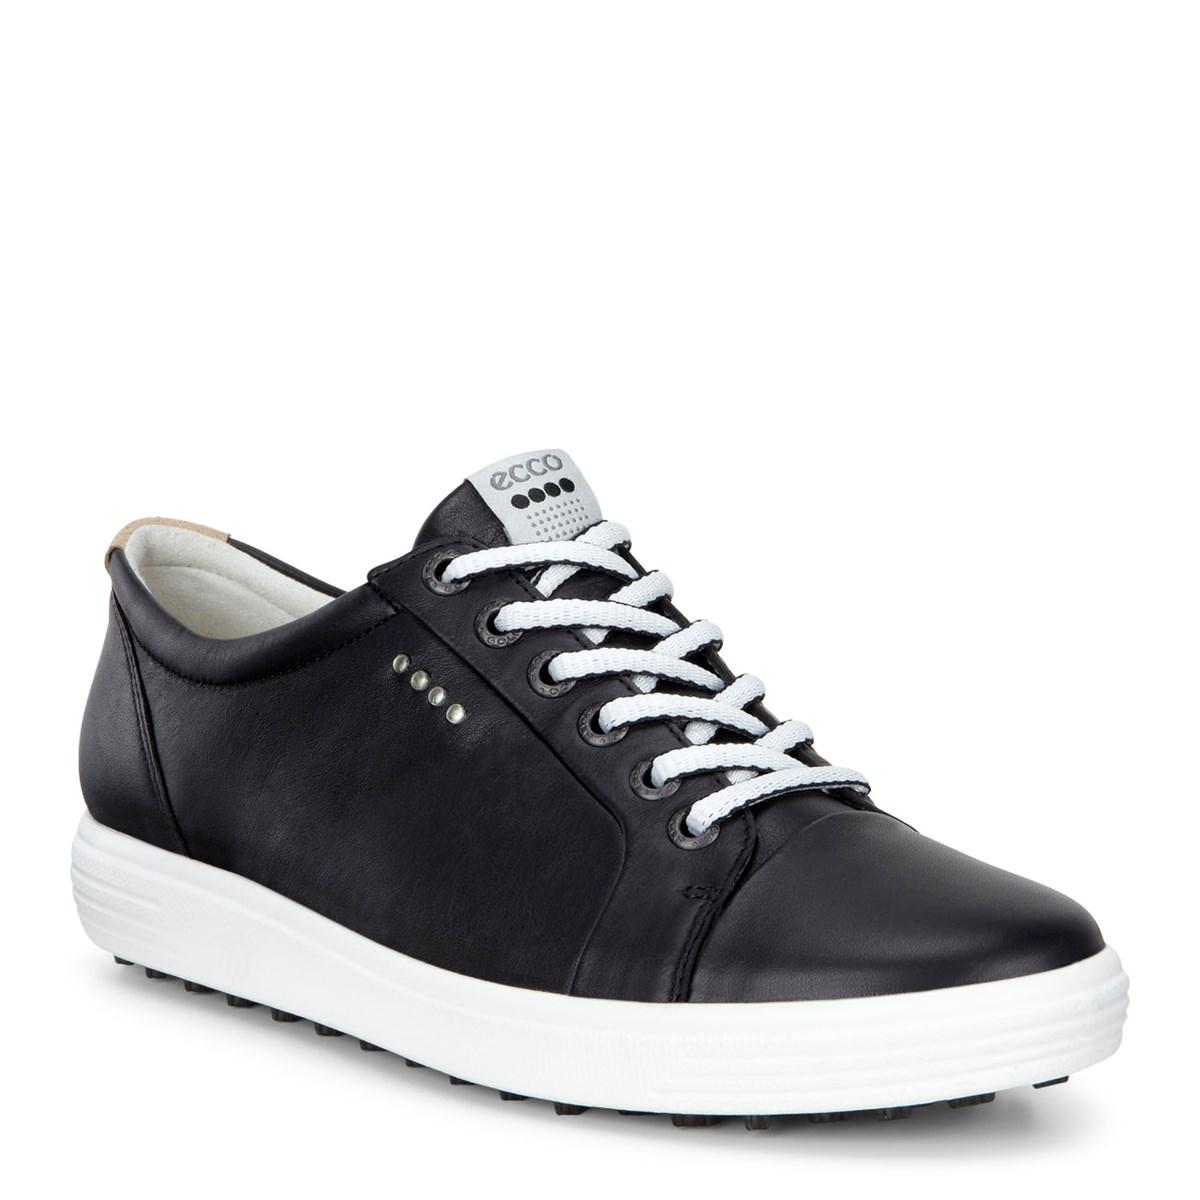 b67611bd88 Shop Womens - GOLF CASUAL HYBRID WOMEN'S - ECCO Shoes NZ